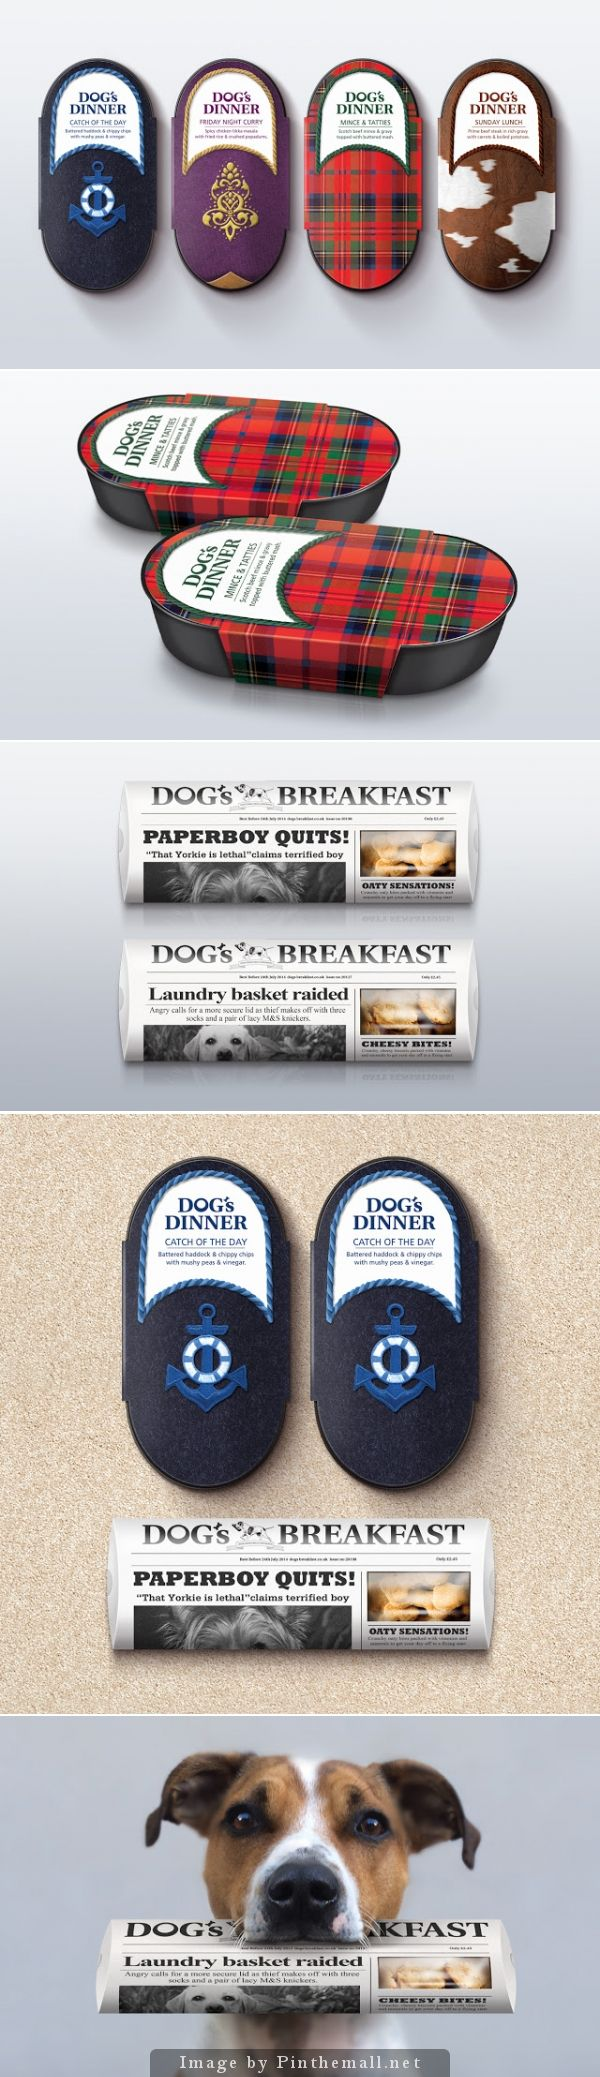 #Dog's Dinner (Concept), Creative Agency: Afterhours - http://www.packagingoftheworld.com/2014/10/dogs-dinner-concept.html